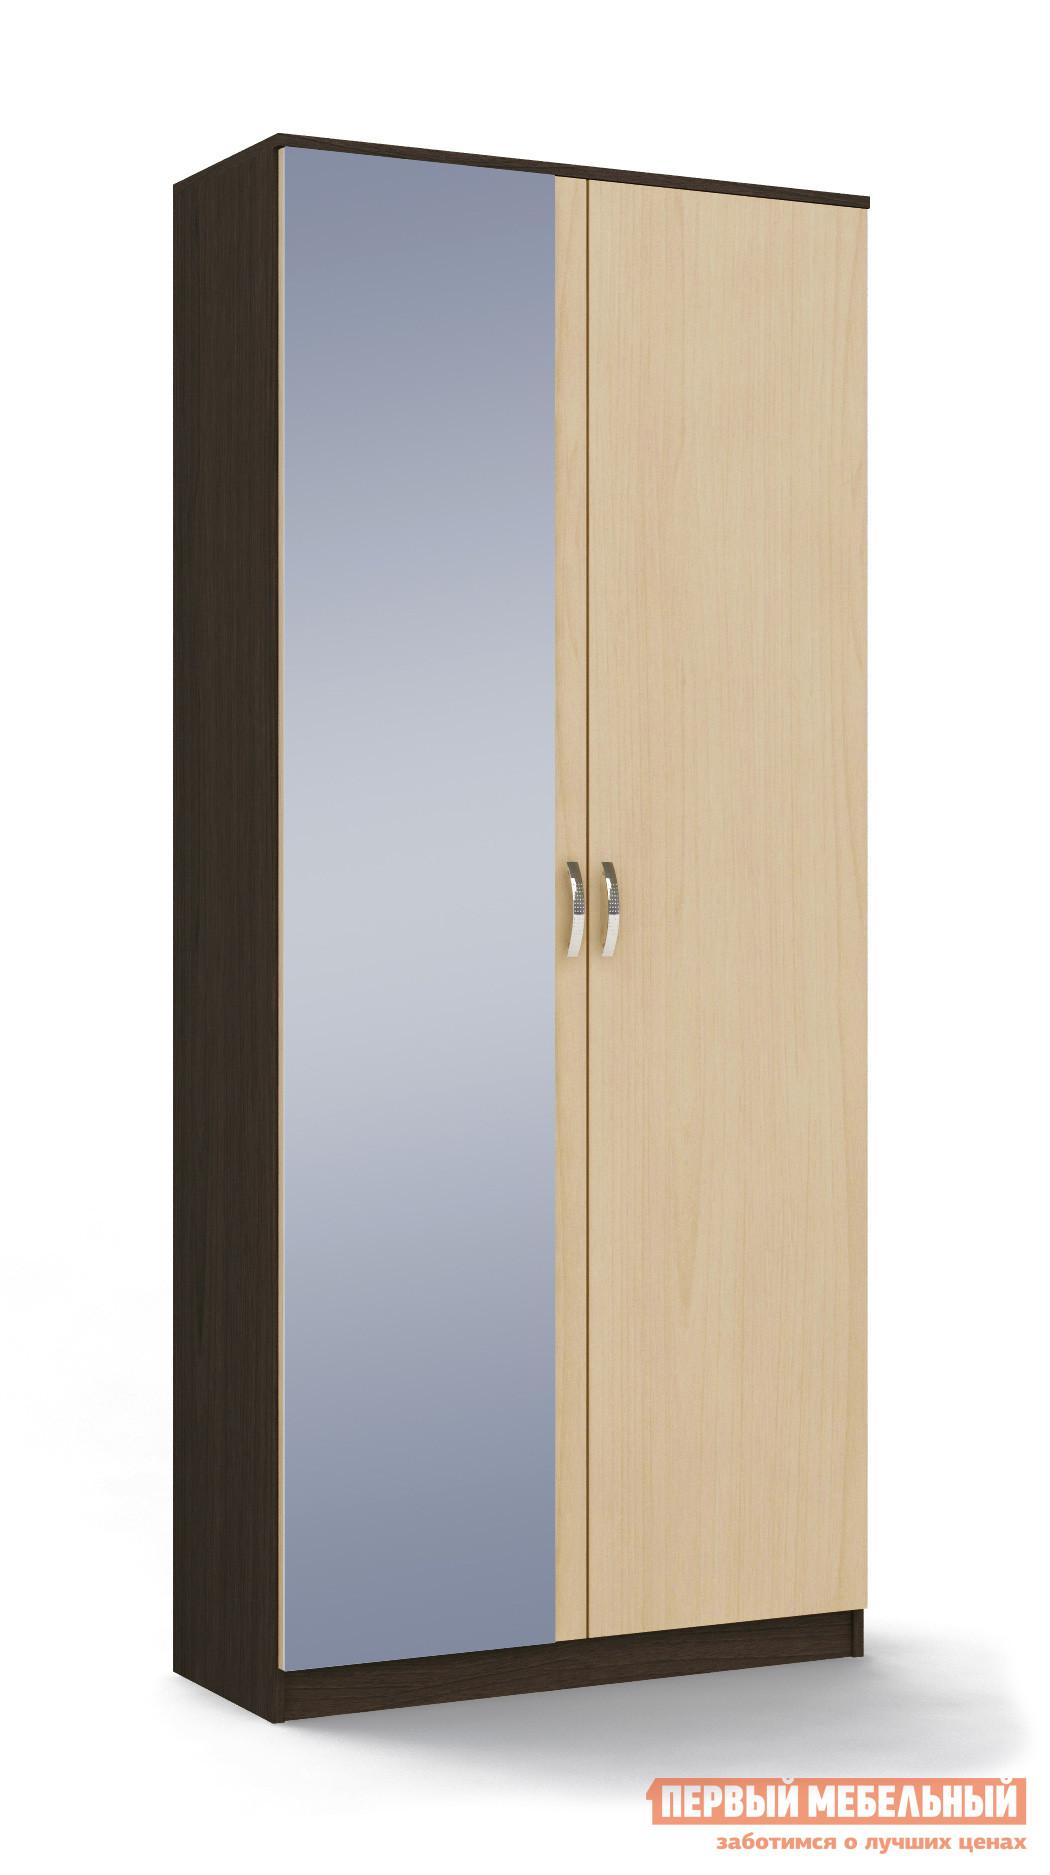 Шкаф распашной МФ Мастер Шкаф 2дверный с зеркалом (Ш2З)